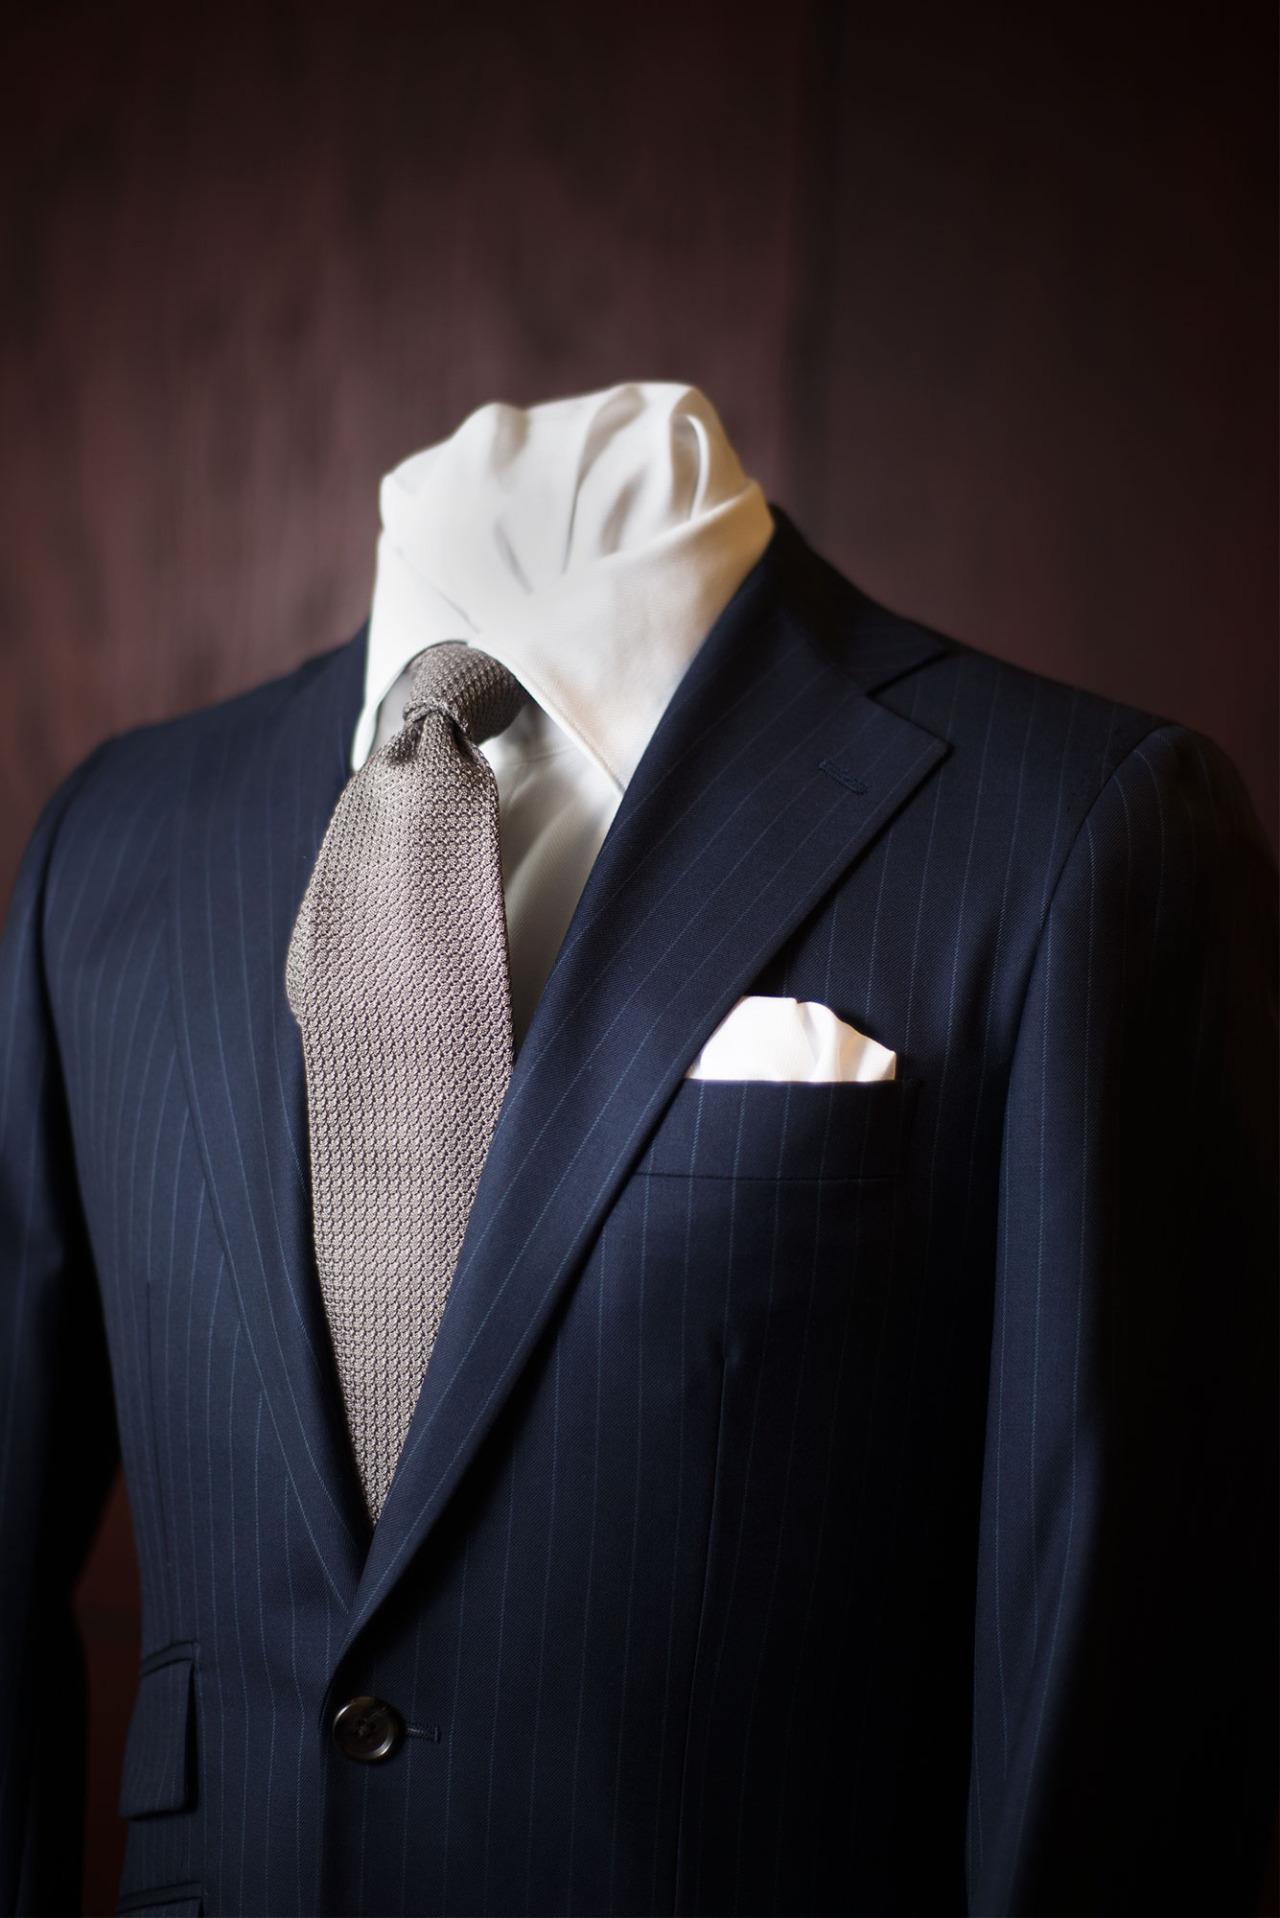 1701 Bespoke Grenadine Tie+ Navy pinstripe suit